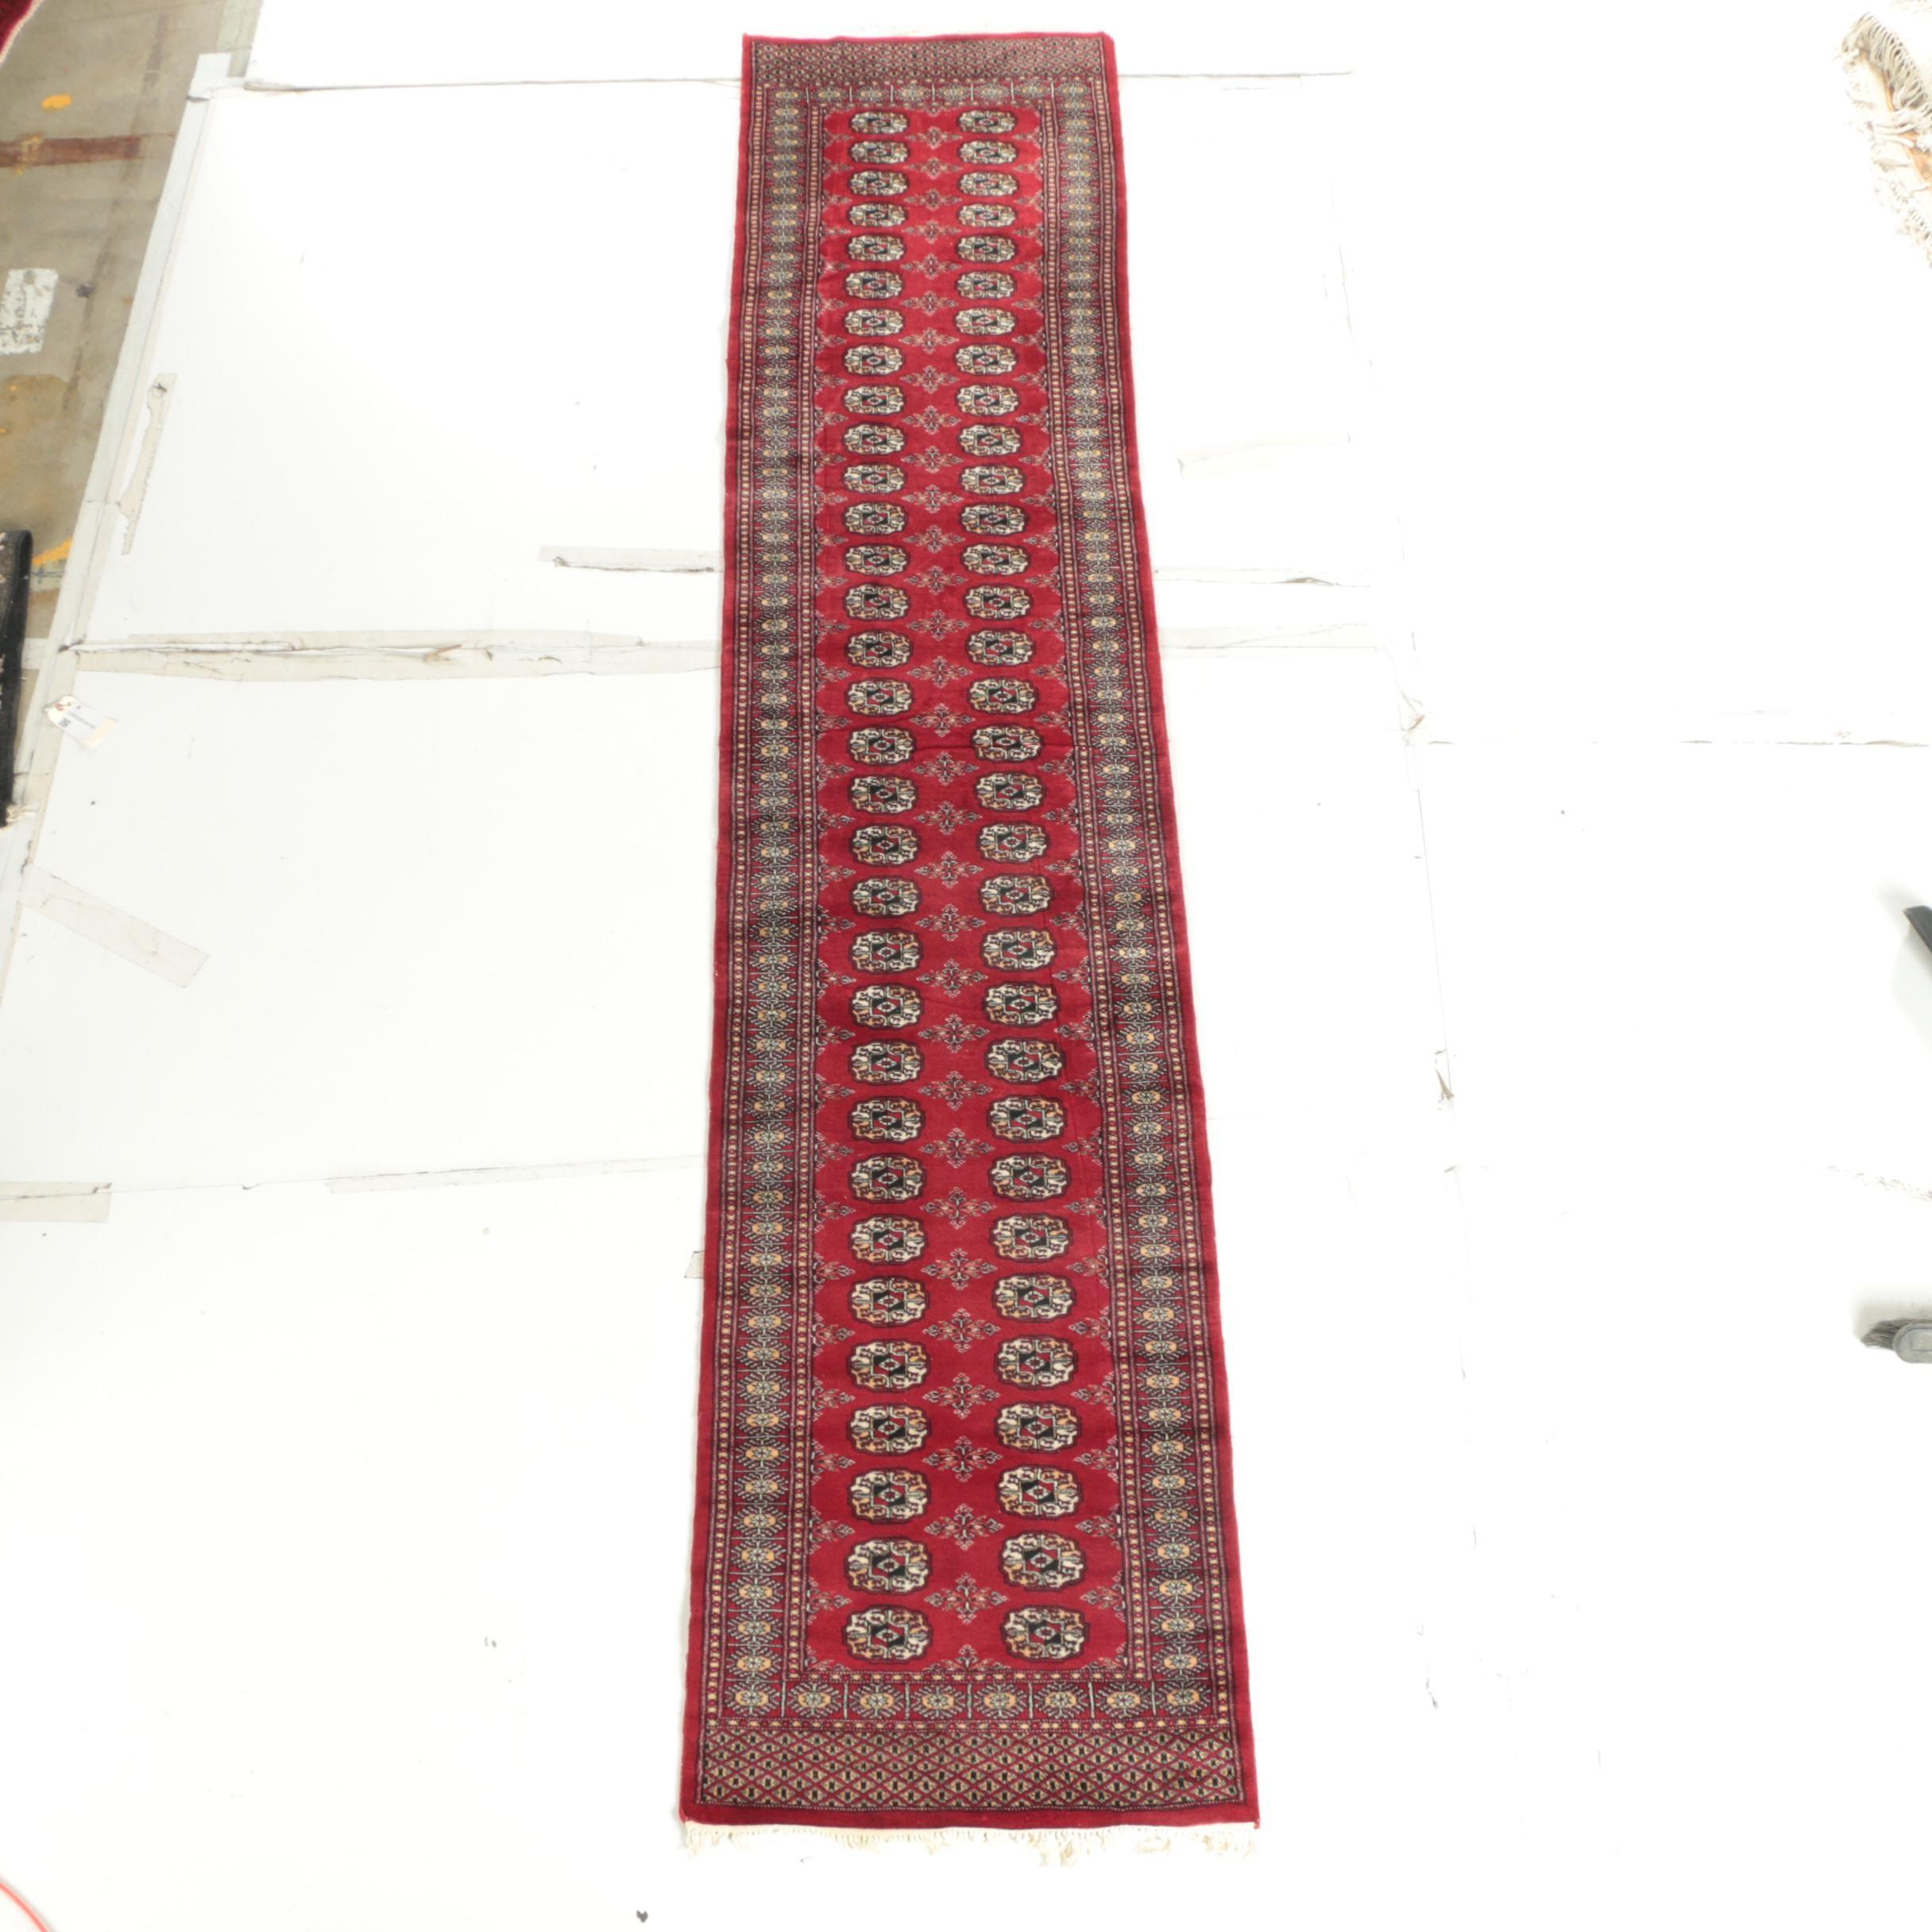 Hand-Knotted Pakistani Bokhara Wool Carpet Runner